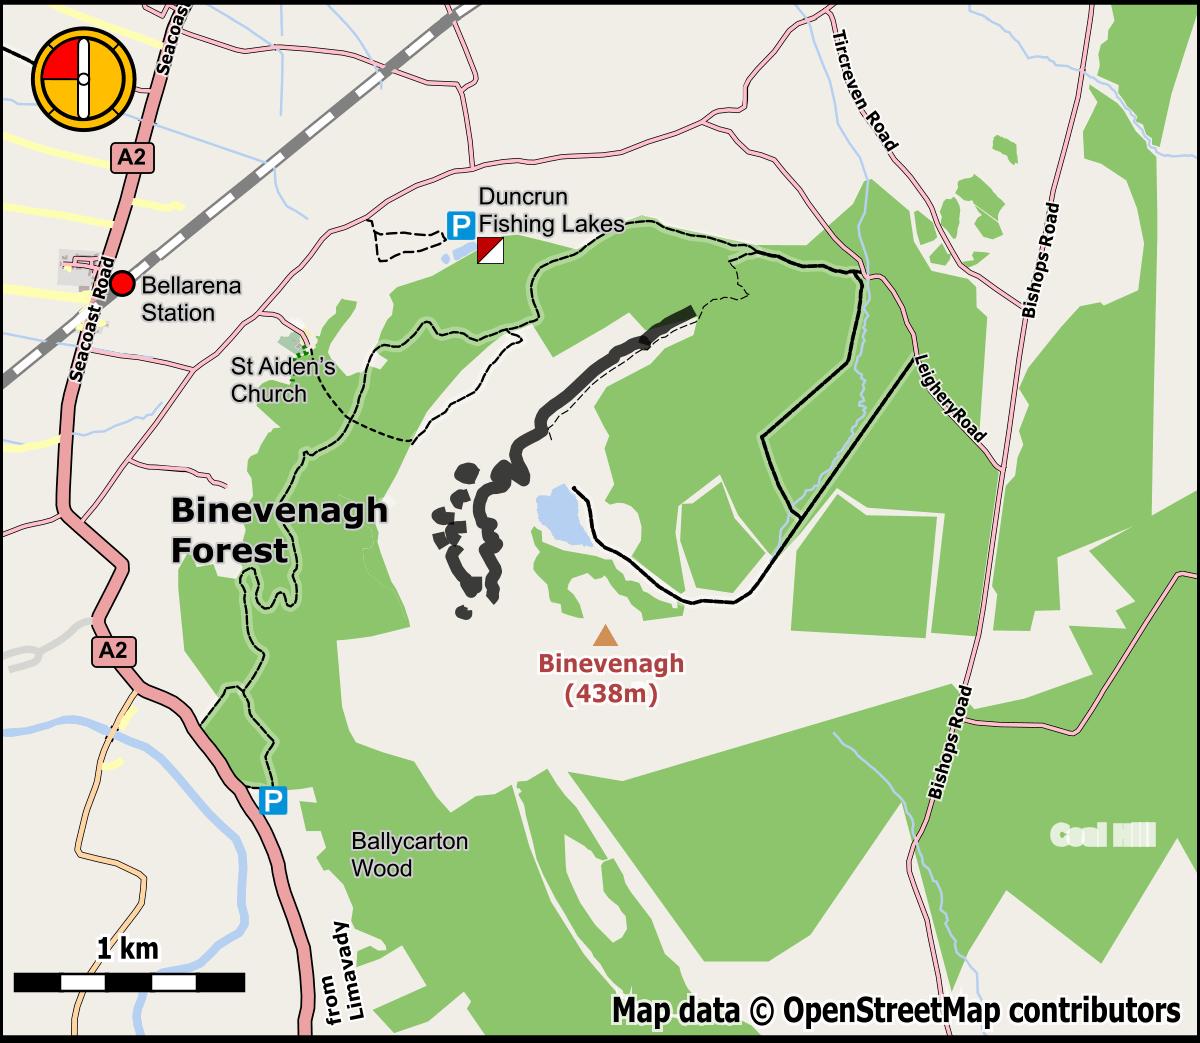 Duncrun Fishing Lakes Location Map